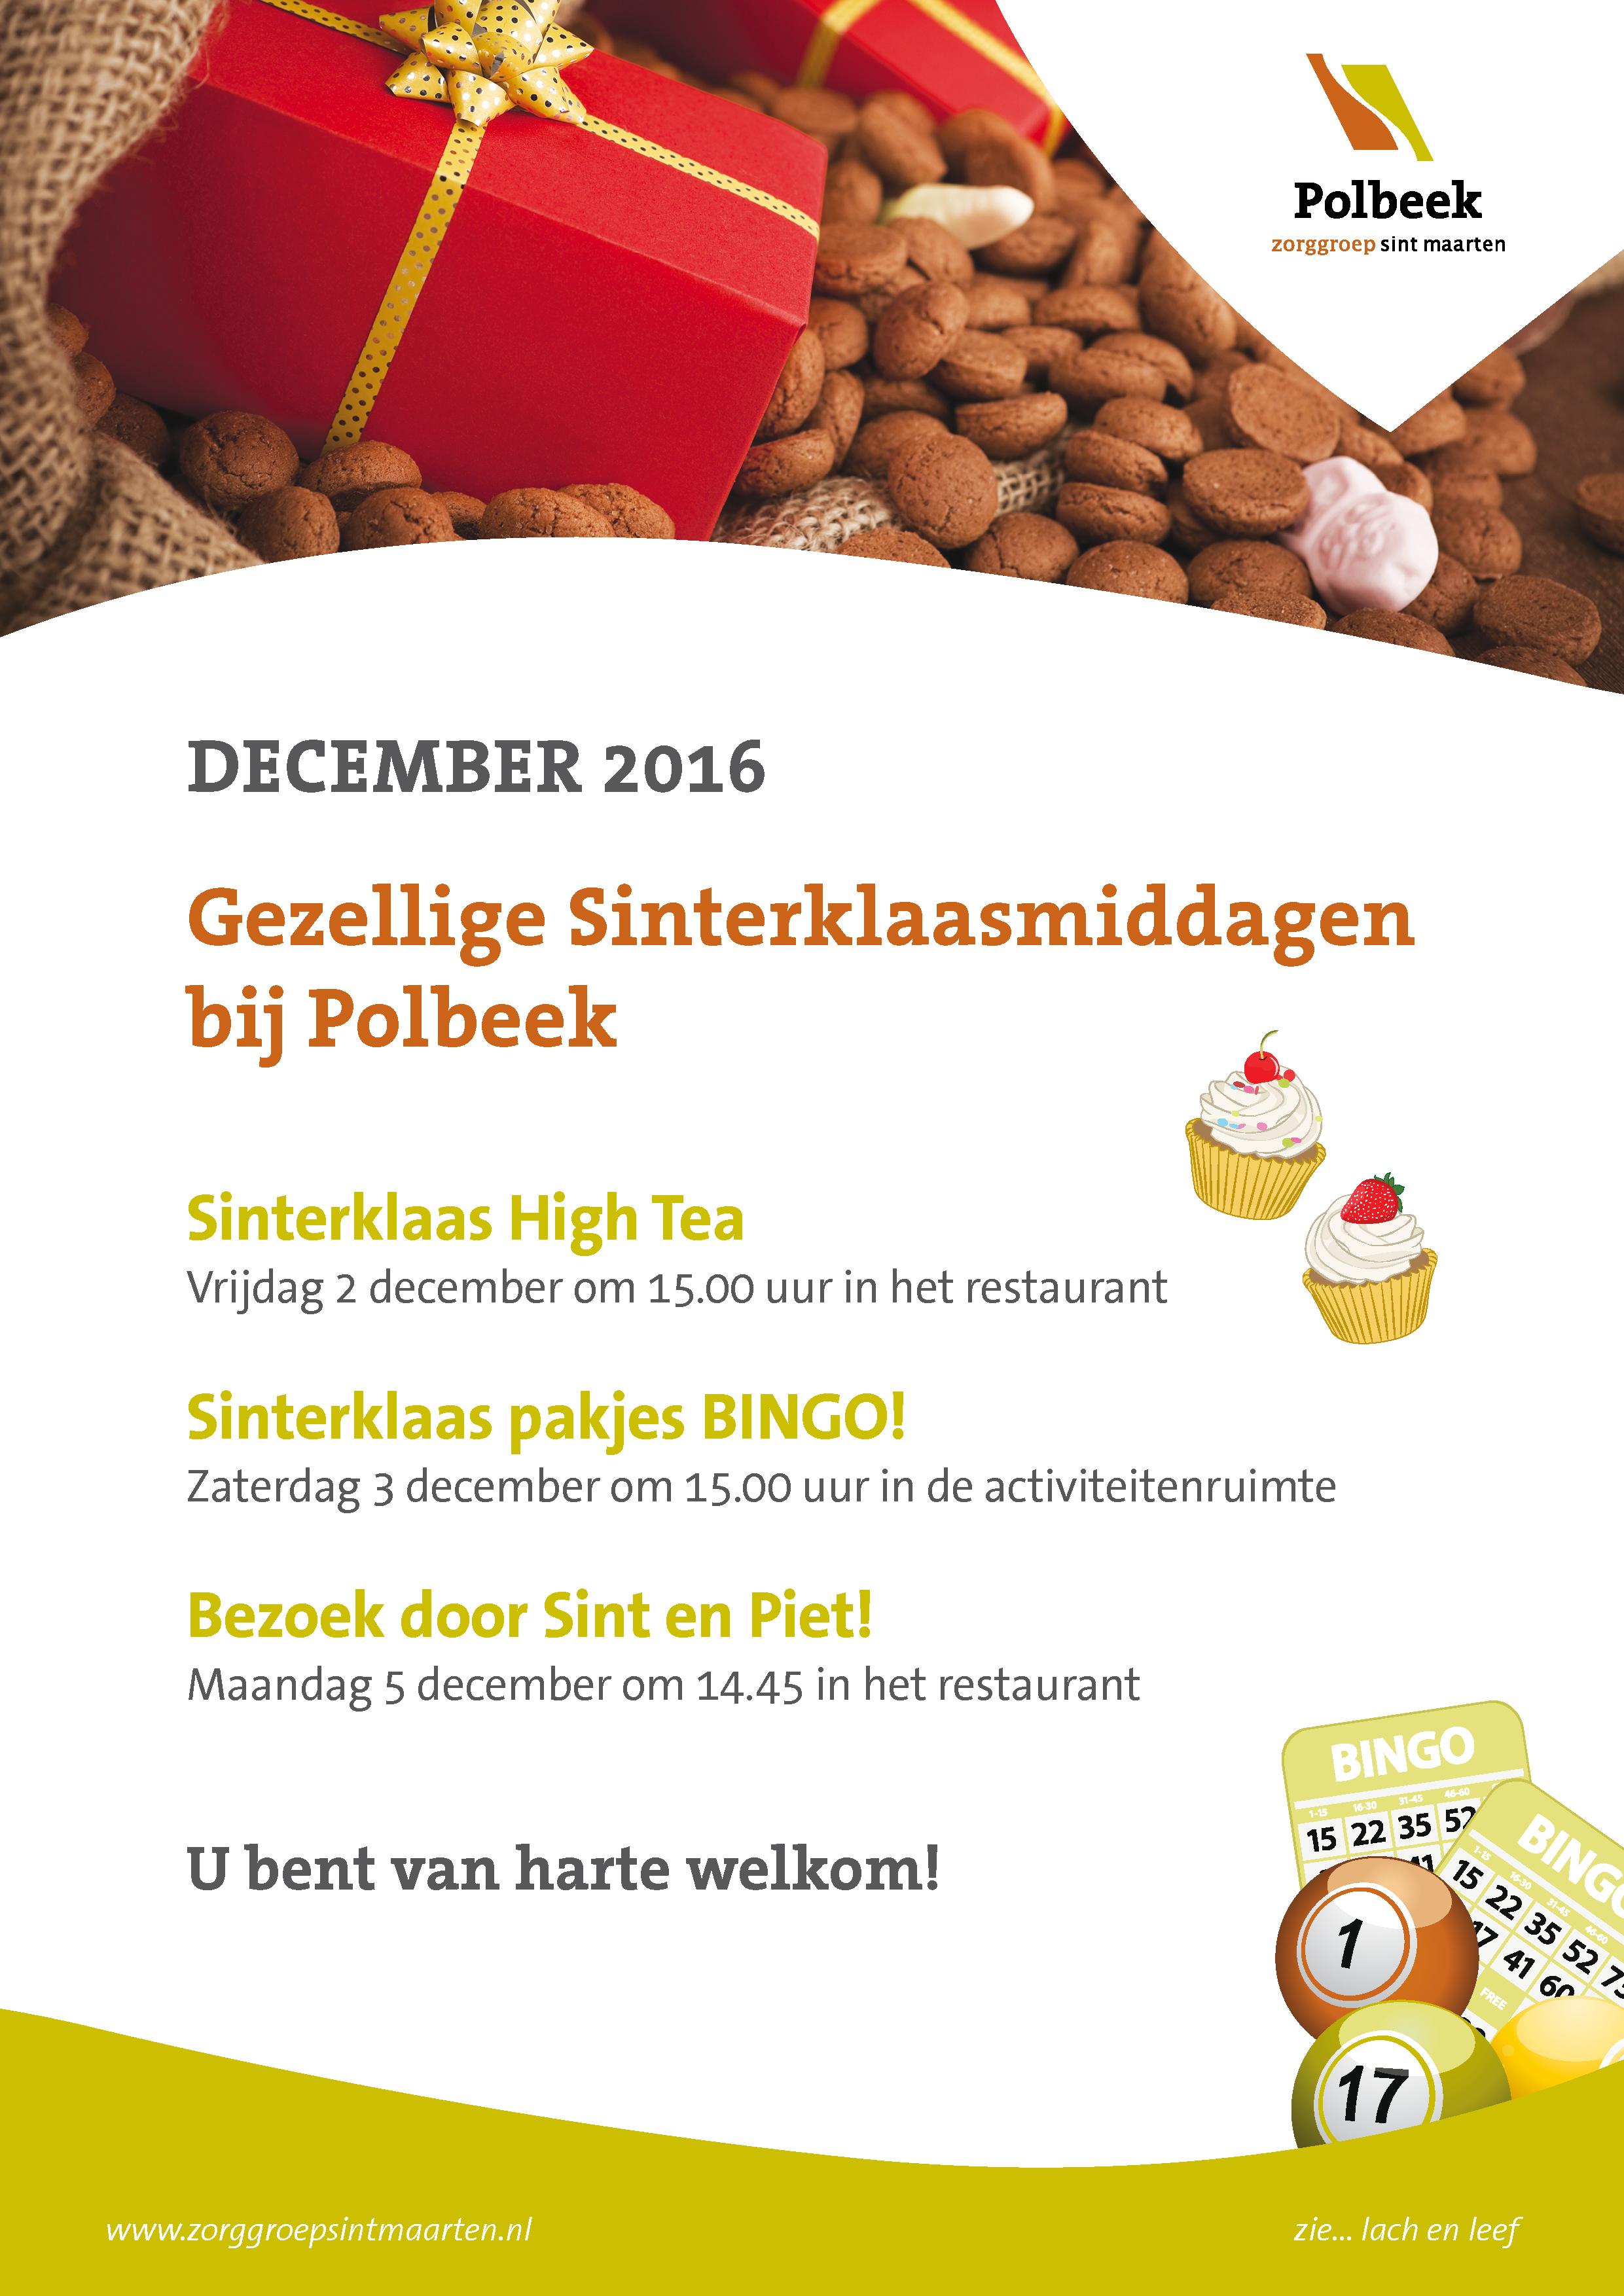 2016-11-21-poster-sinterklaasmiddagen-polbeek-web